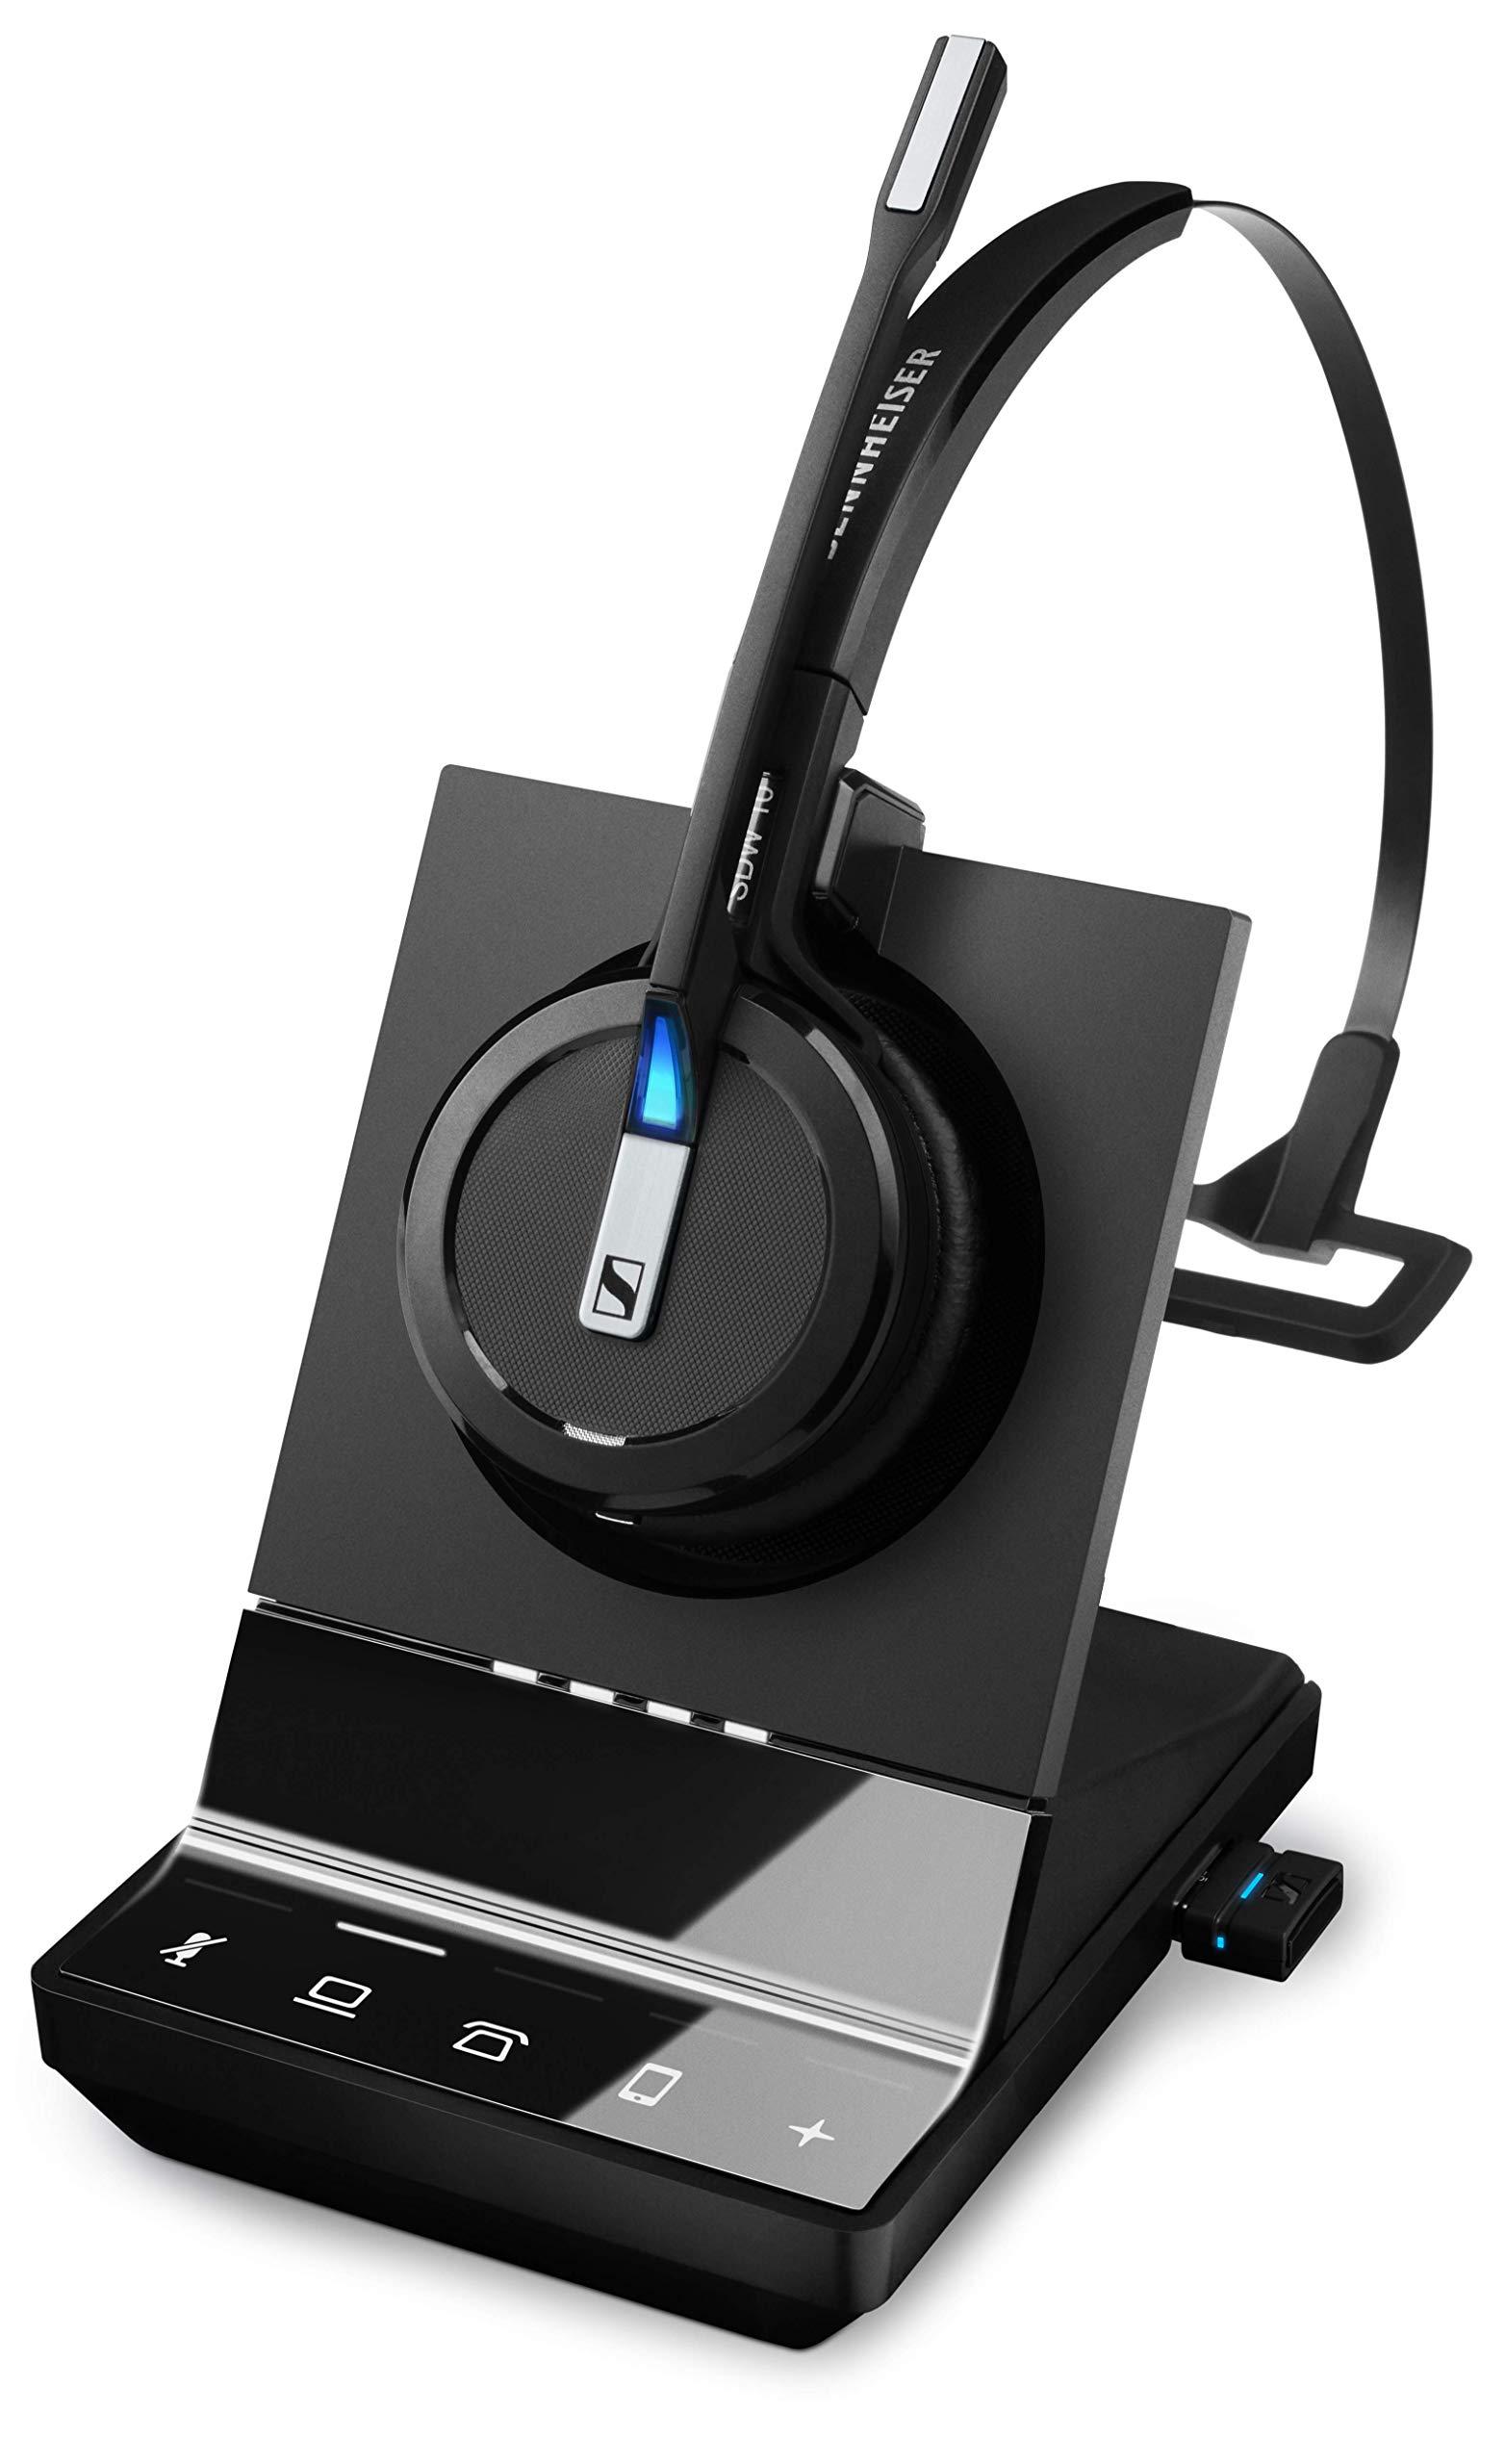 Sennheiser SDW 5016 (507016) Single-Sided Wireless DECT Headset for Desk Phone Softphone/PC& Mobile Phone Connection Dual Microphone Ultra Noise-Canceling, Black by Sennheiser Enterprise Solution